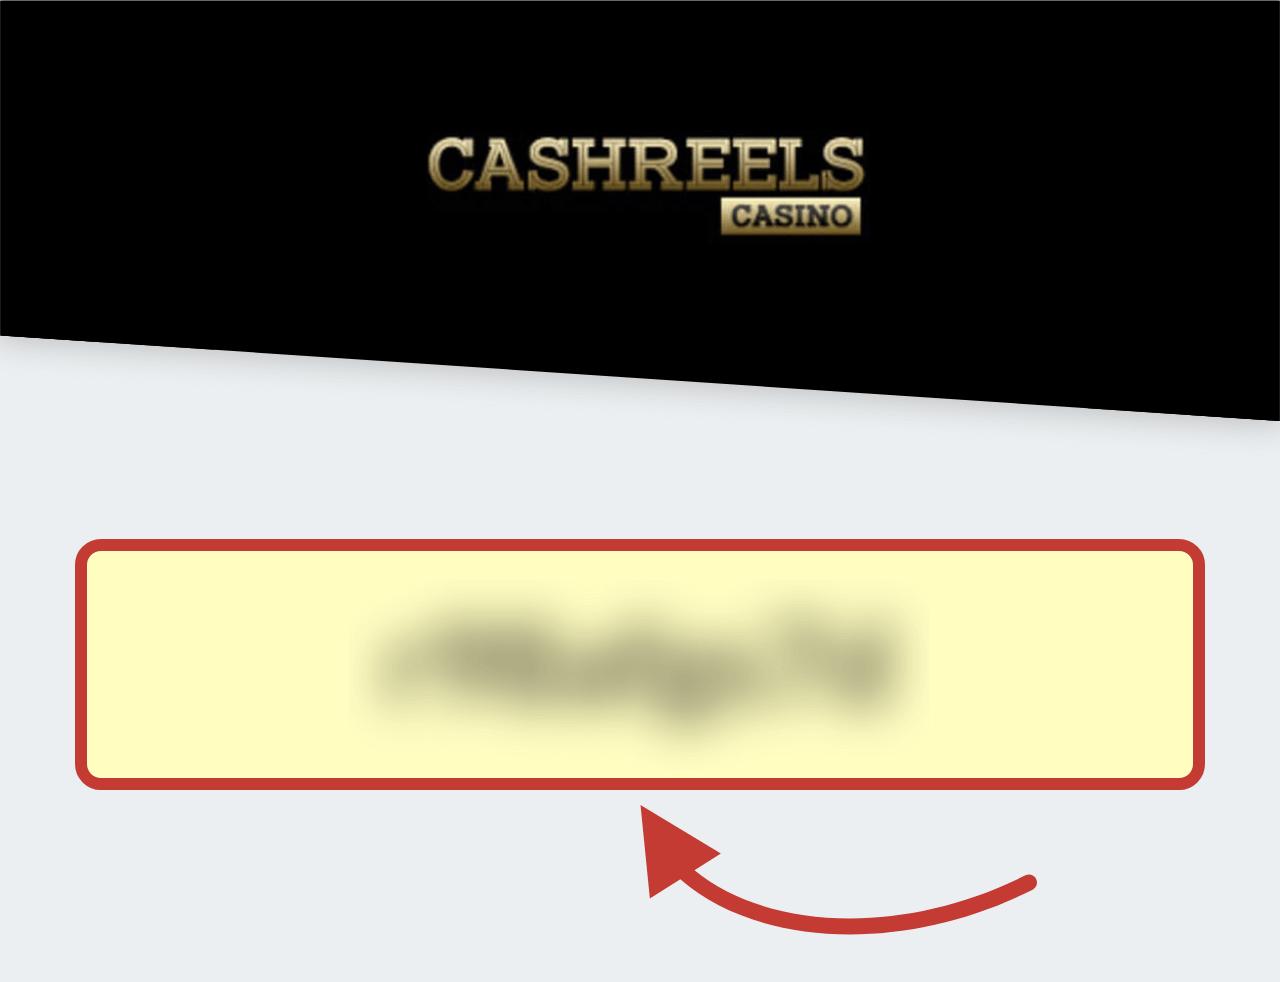 Cashreels Casino Bonus